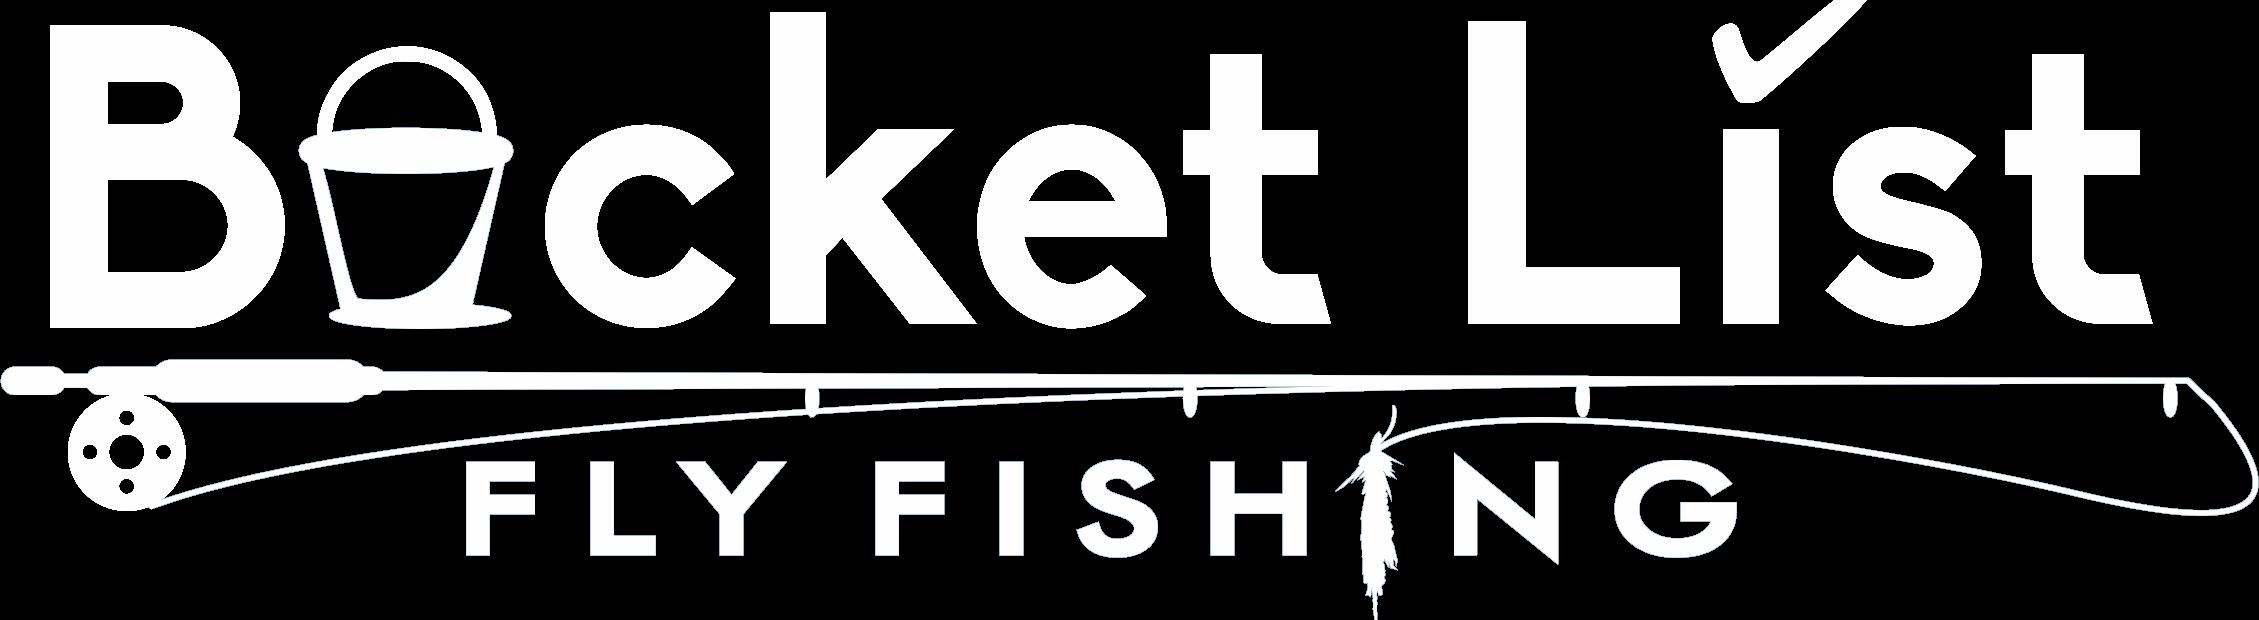 Bucket List Fly Fishing